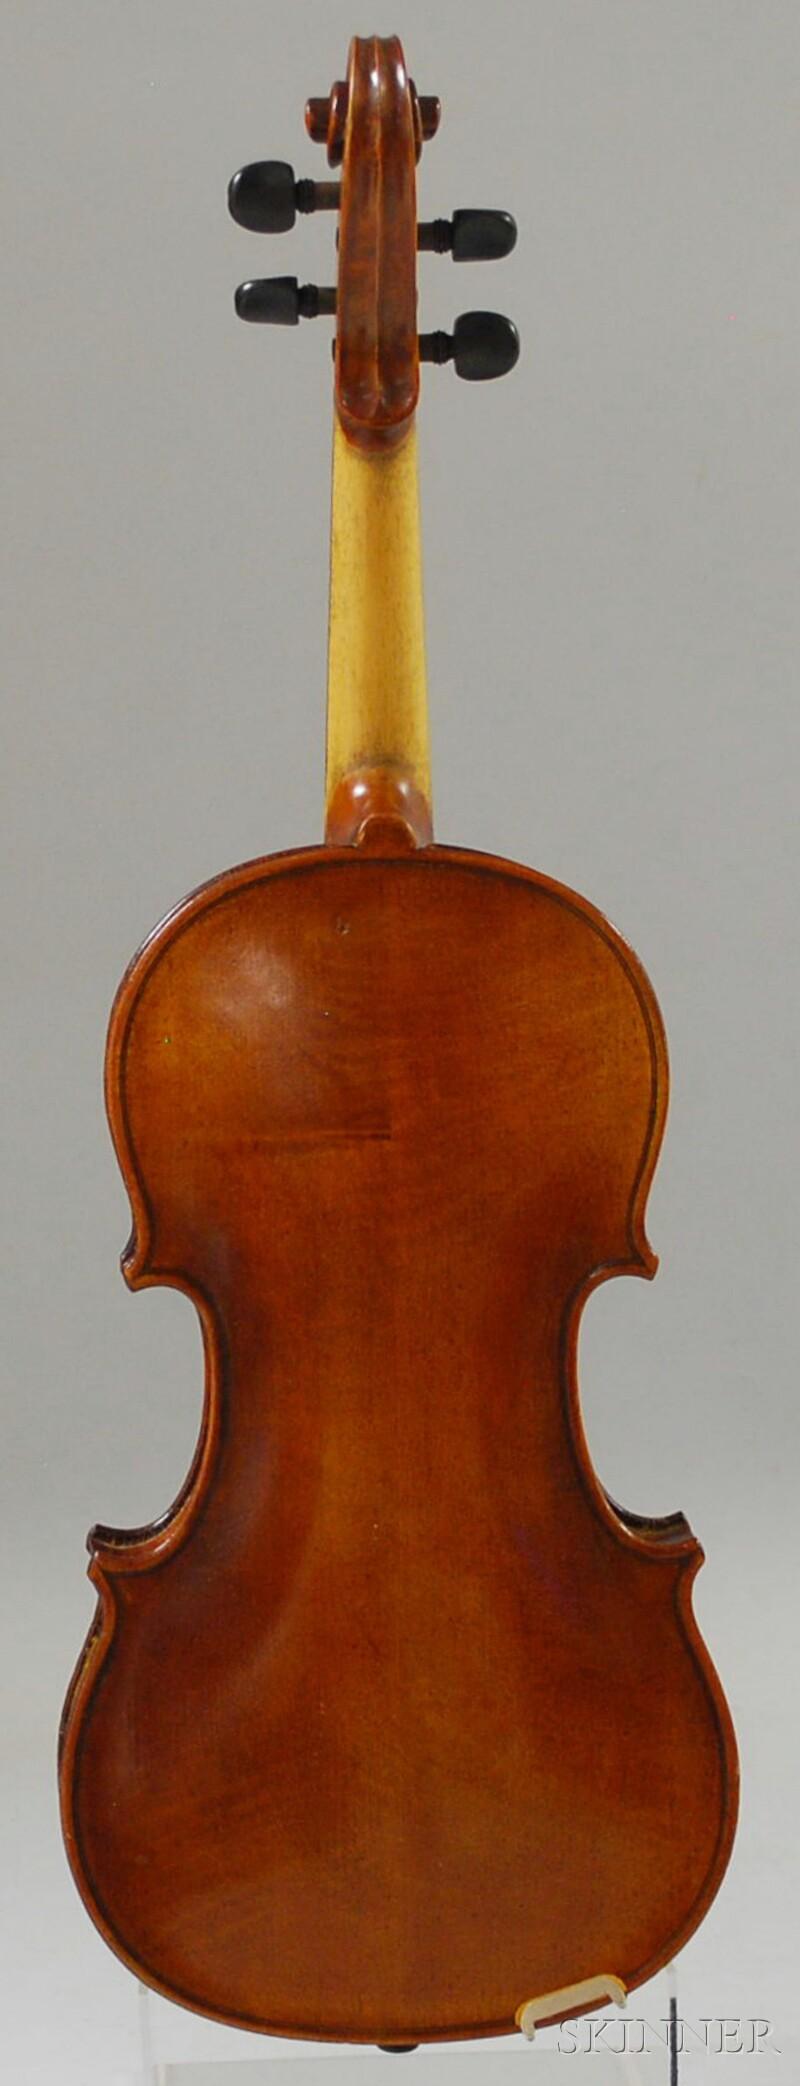 Child's Violin, c. 1940